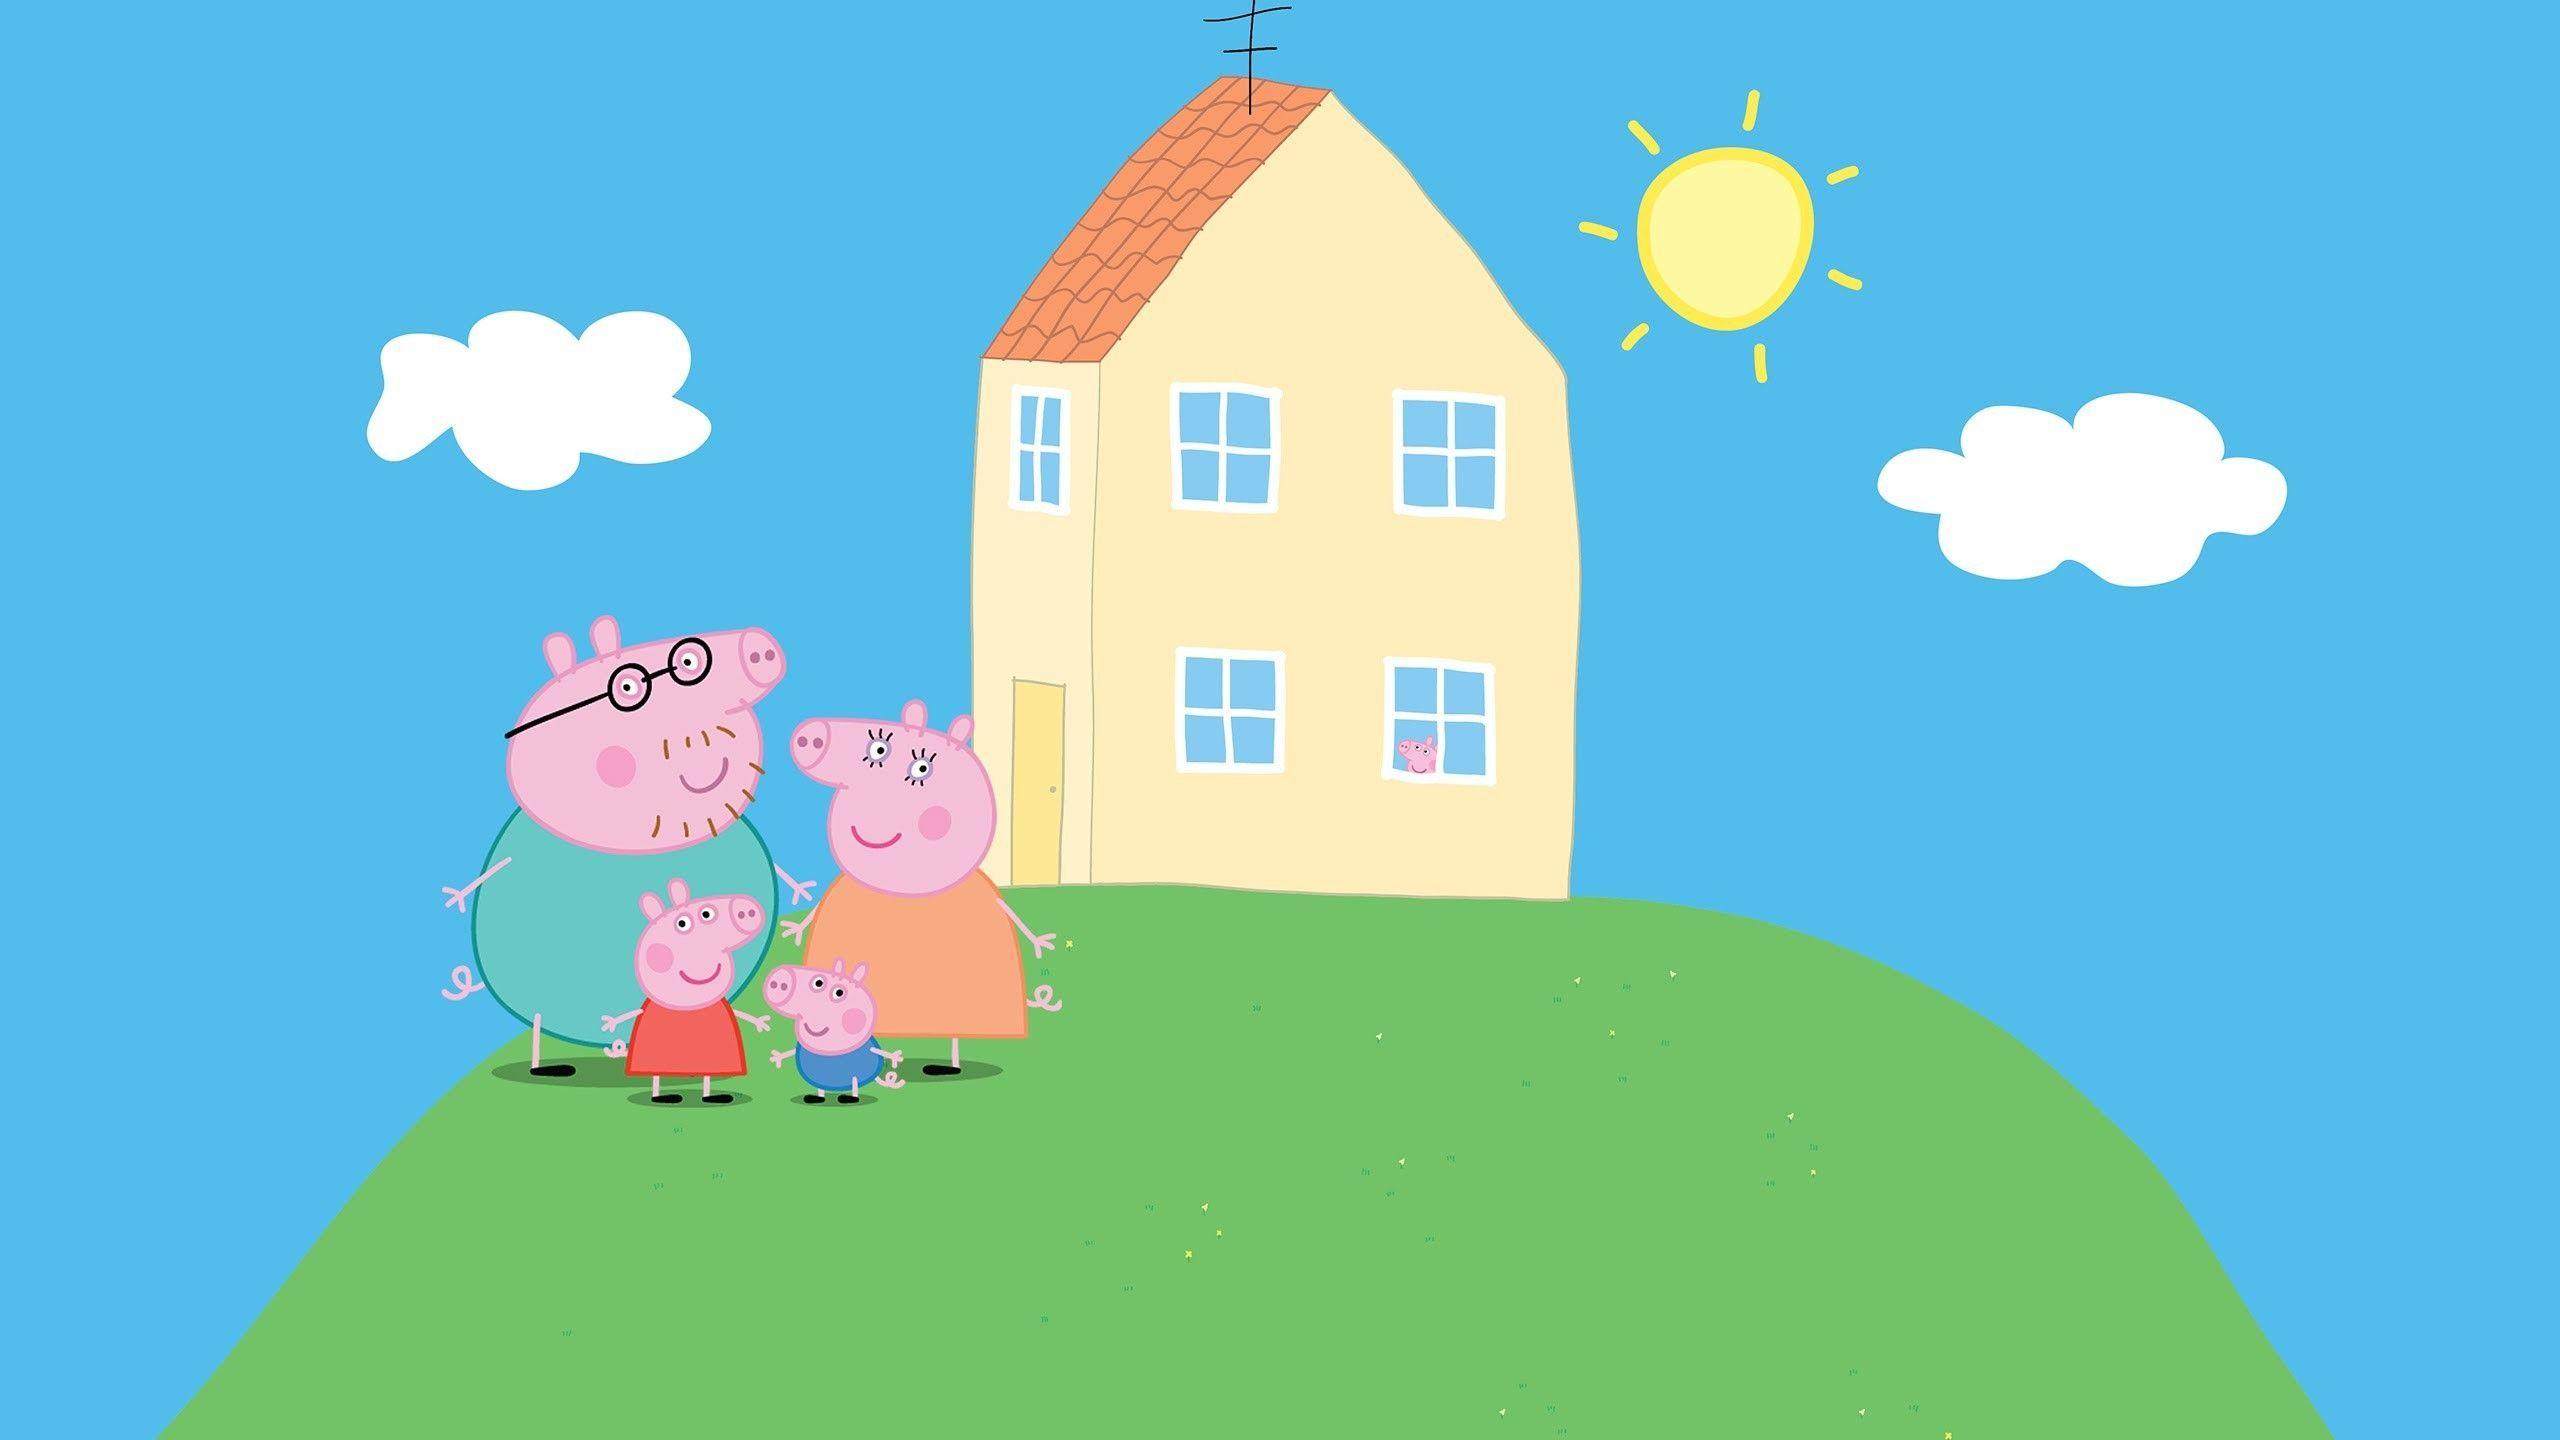 Peppa Pig Zoom Background Peppa pig house Peppa pig colouring 2560x1440